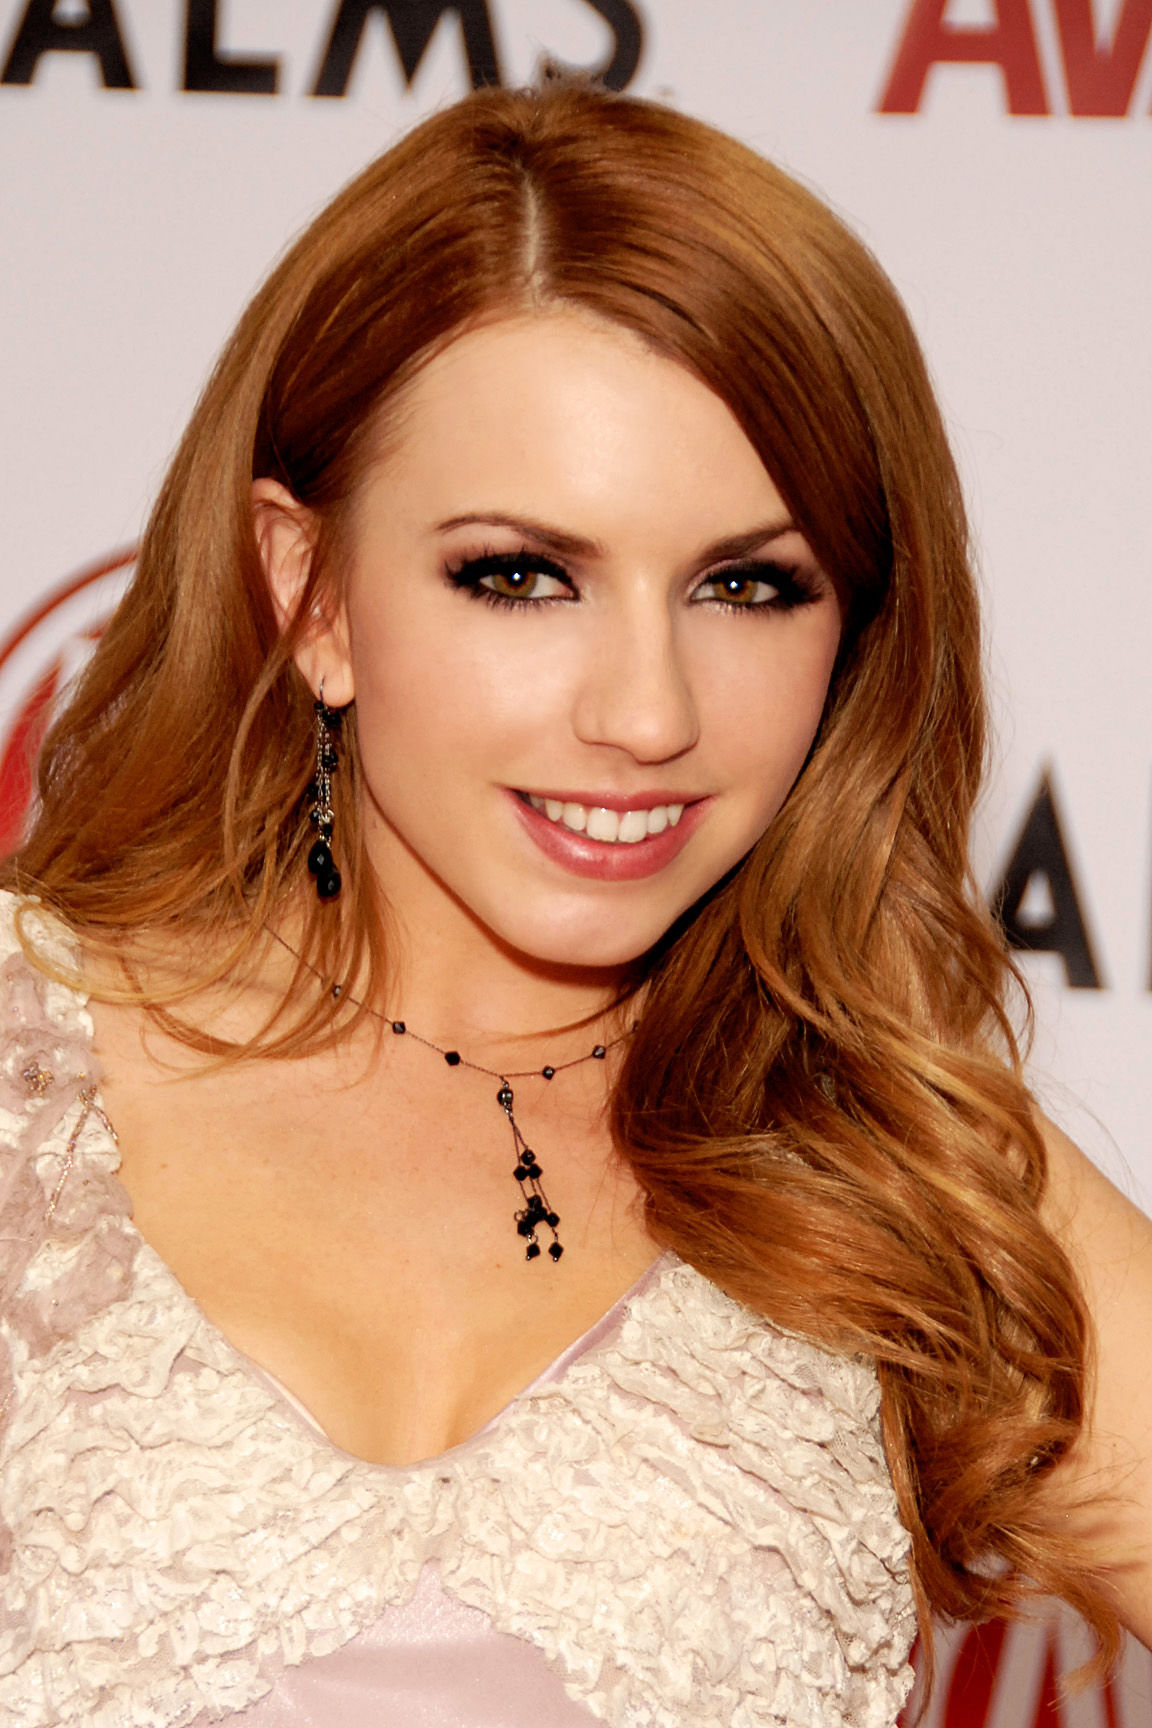 Photo of Lexi Belle: American pornographic actress